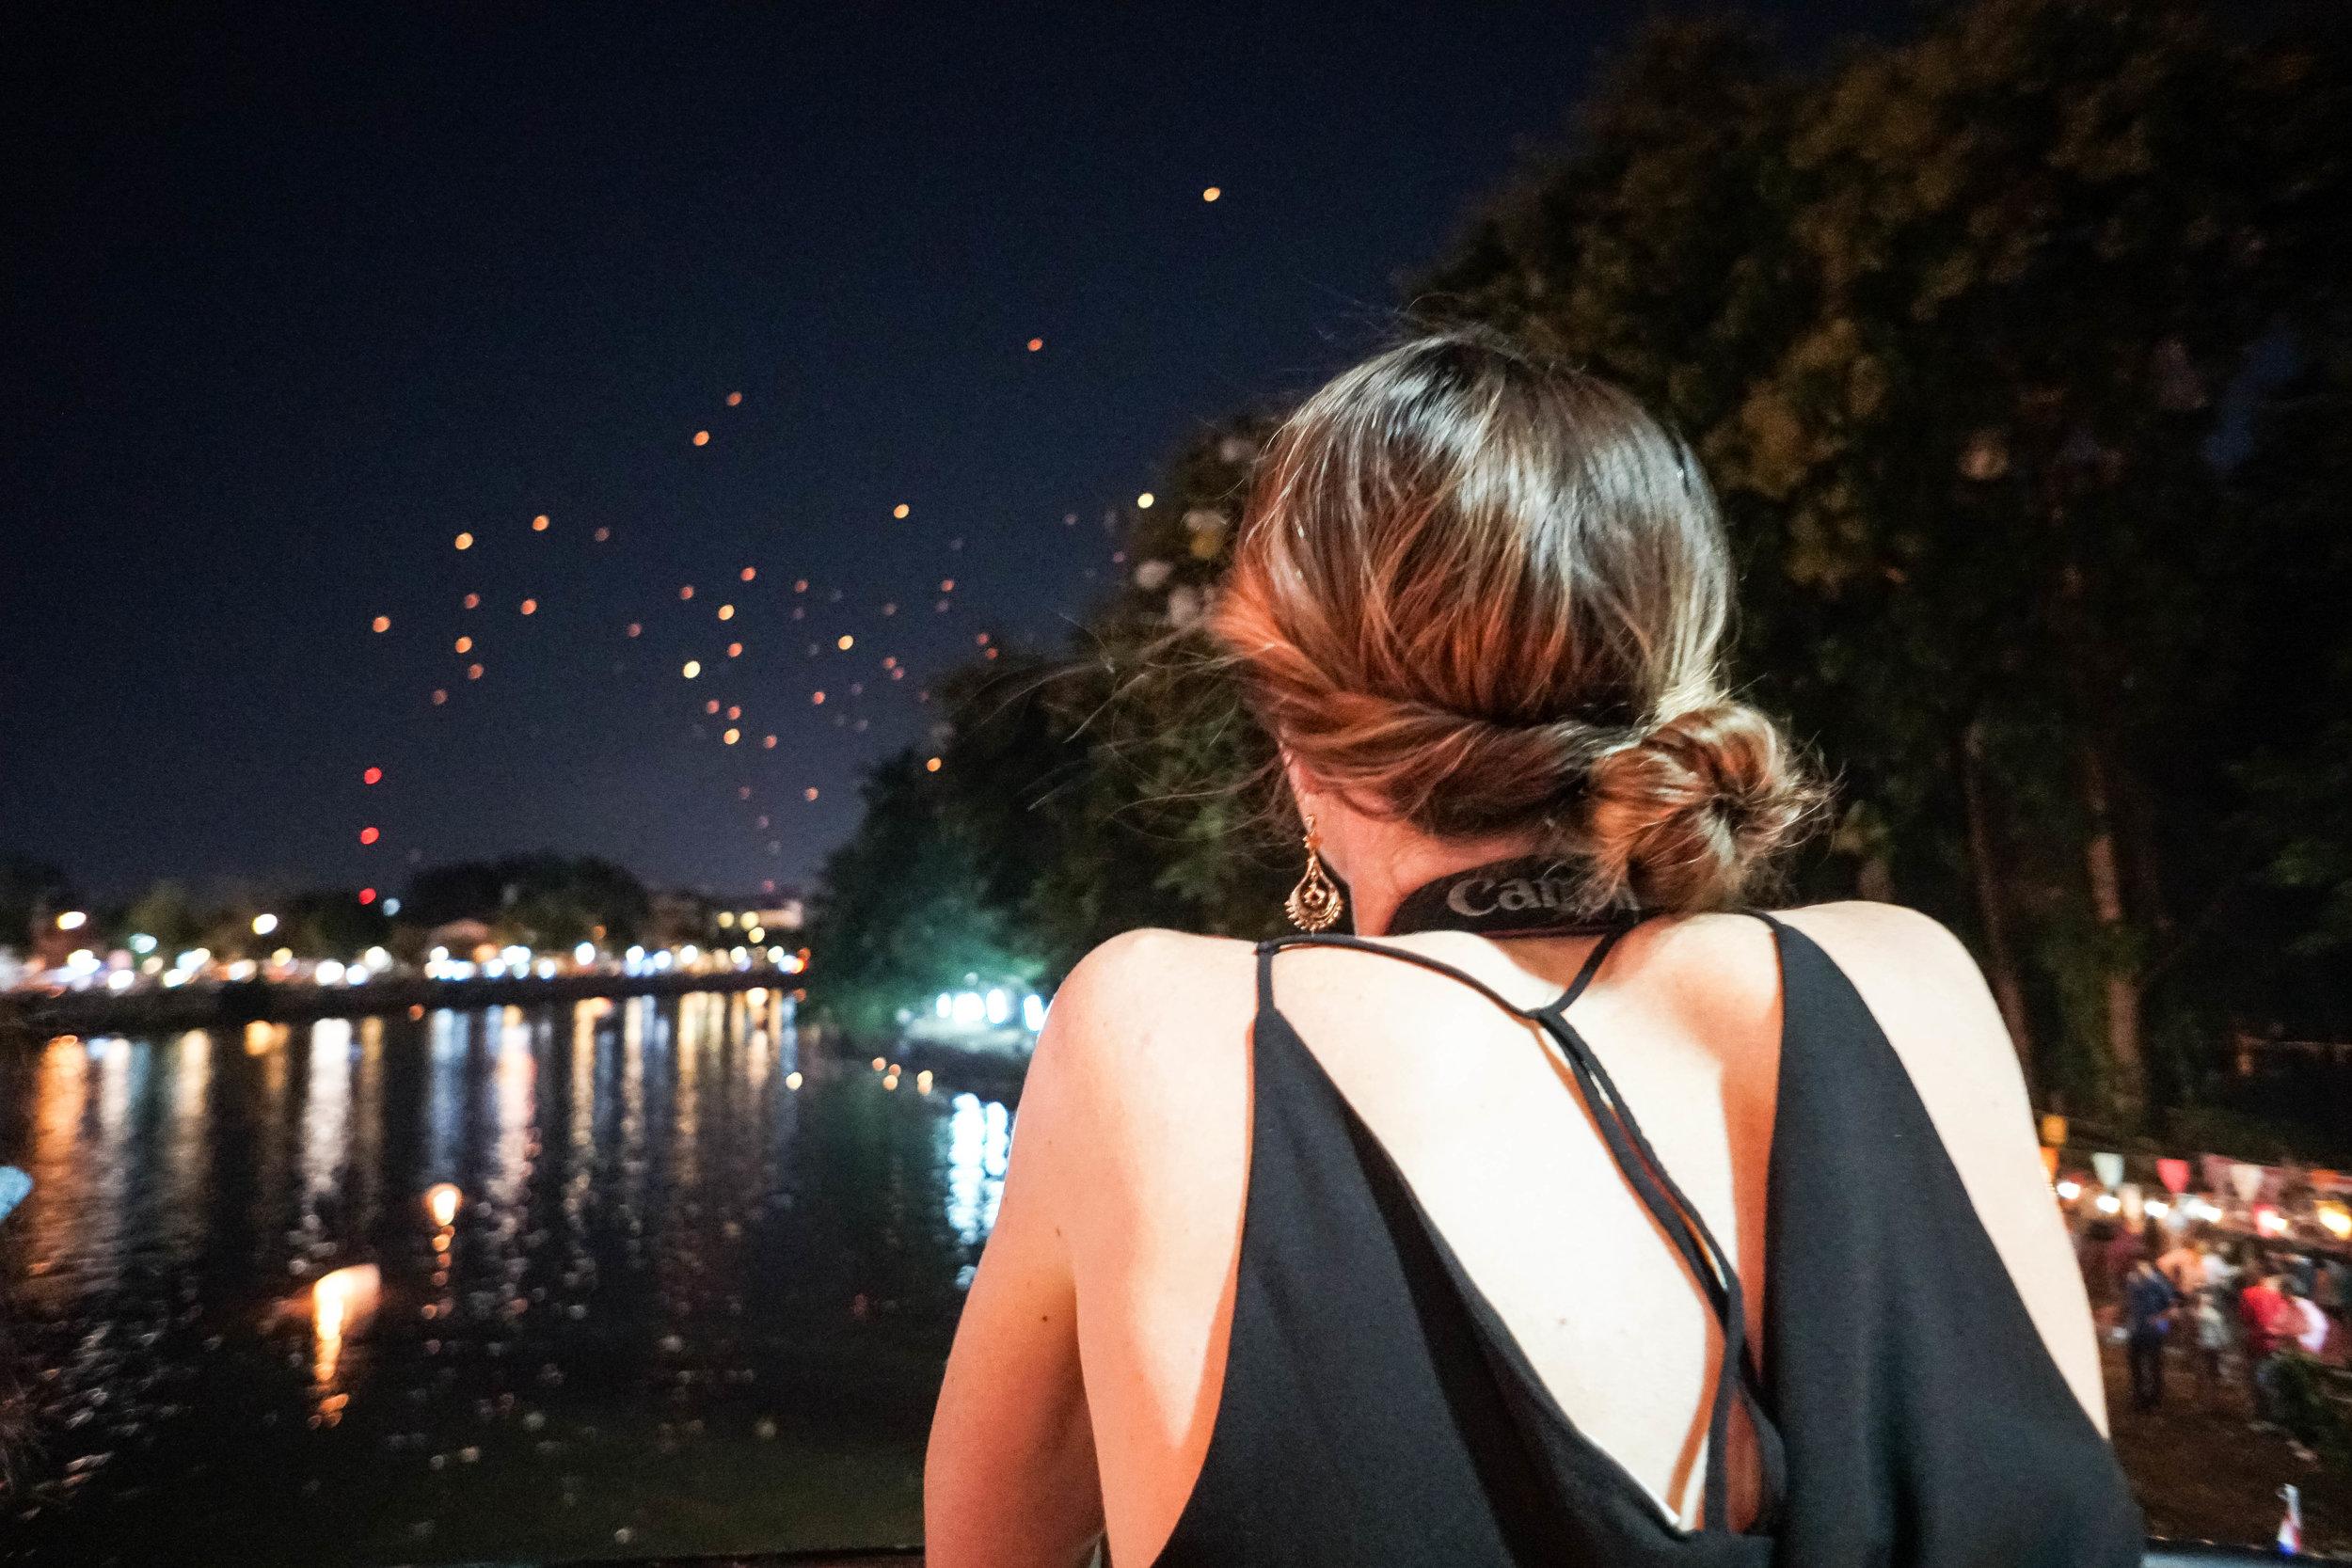 Enjoying the Lantern Festival, which happens every November.